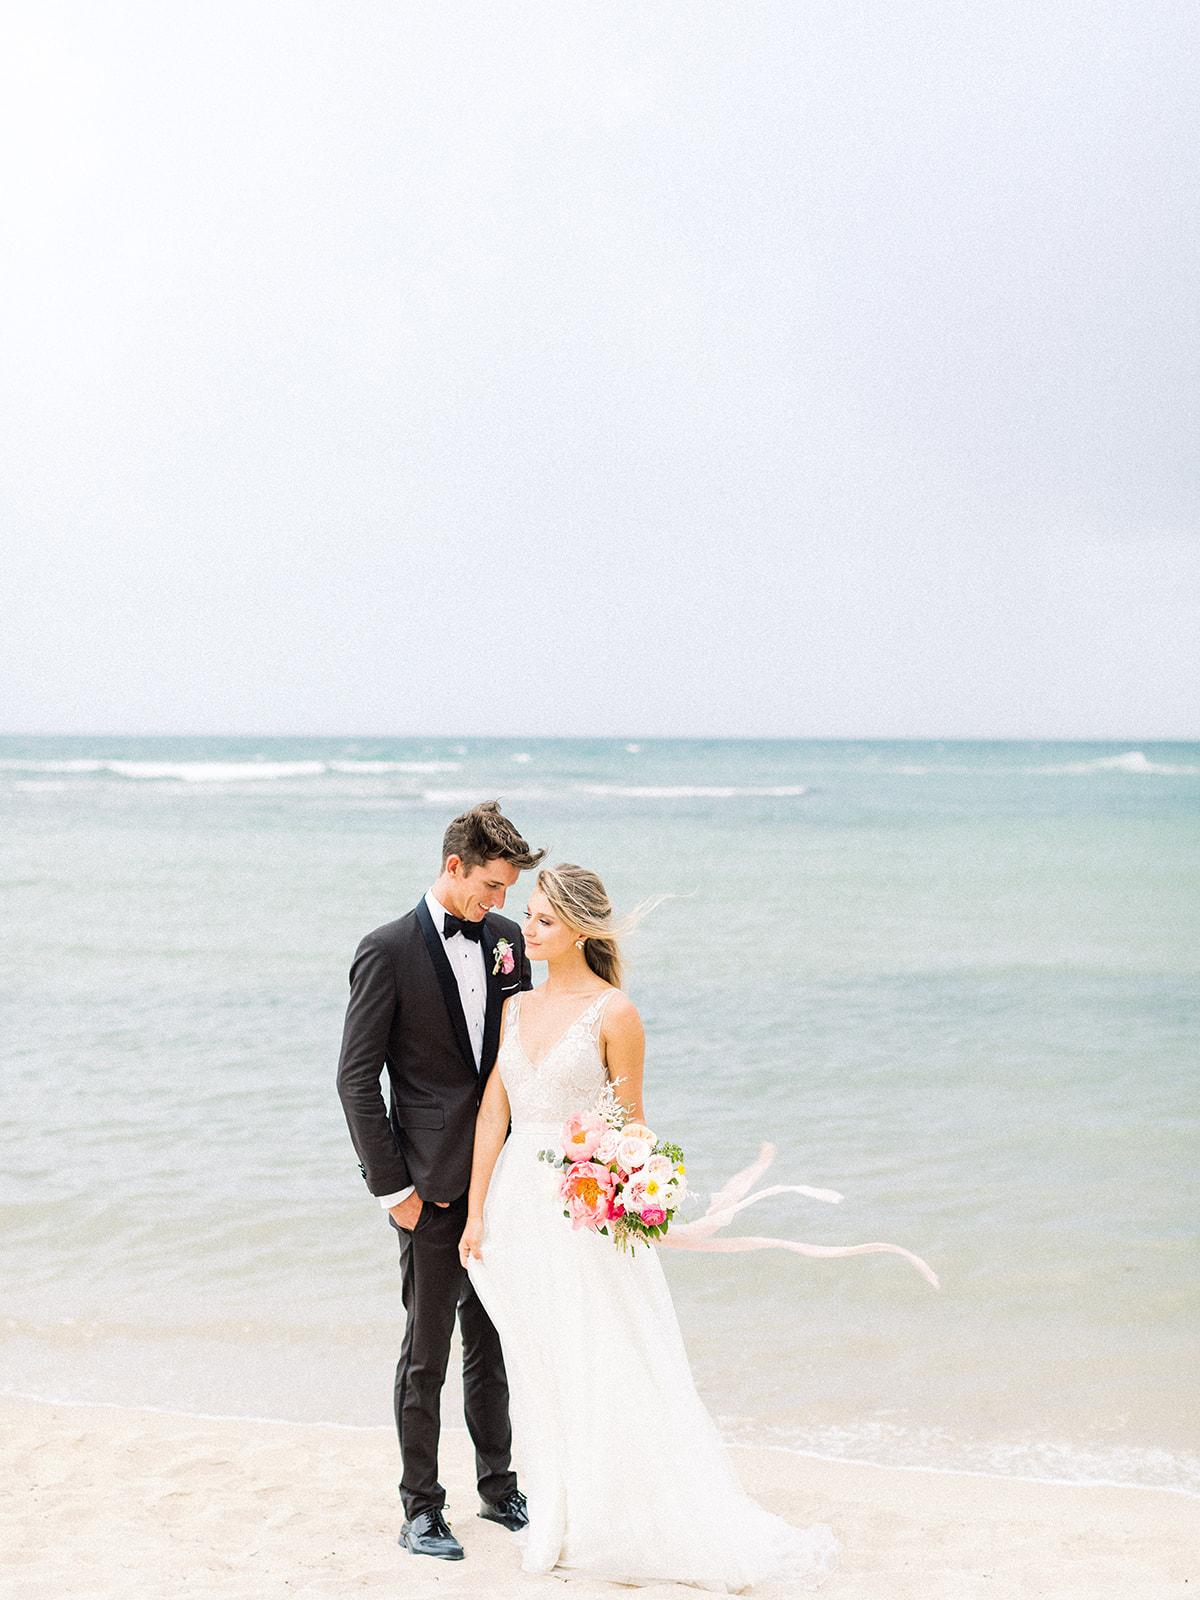 Dominican Republic beach wedding: Beach Wedding Inspiration | Dominican Republic